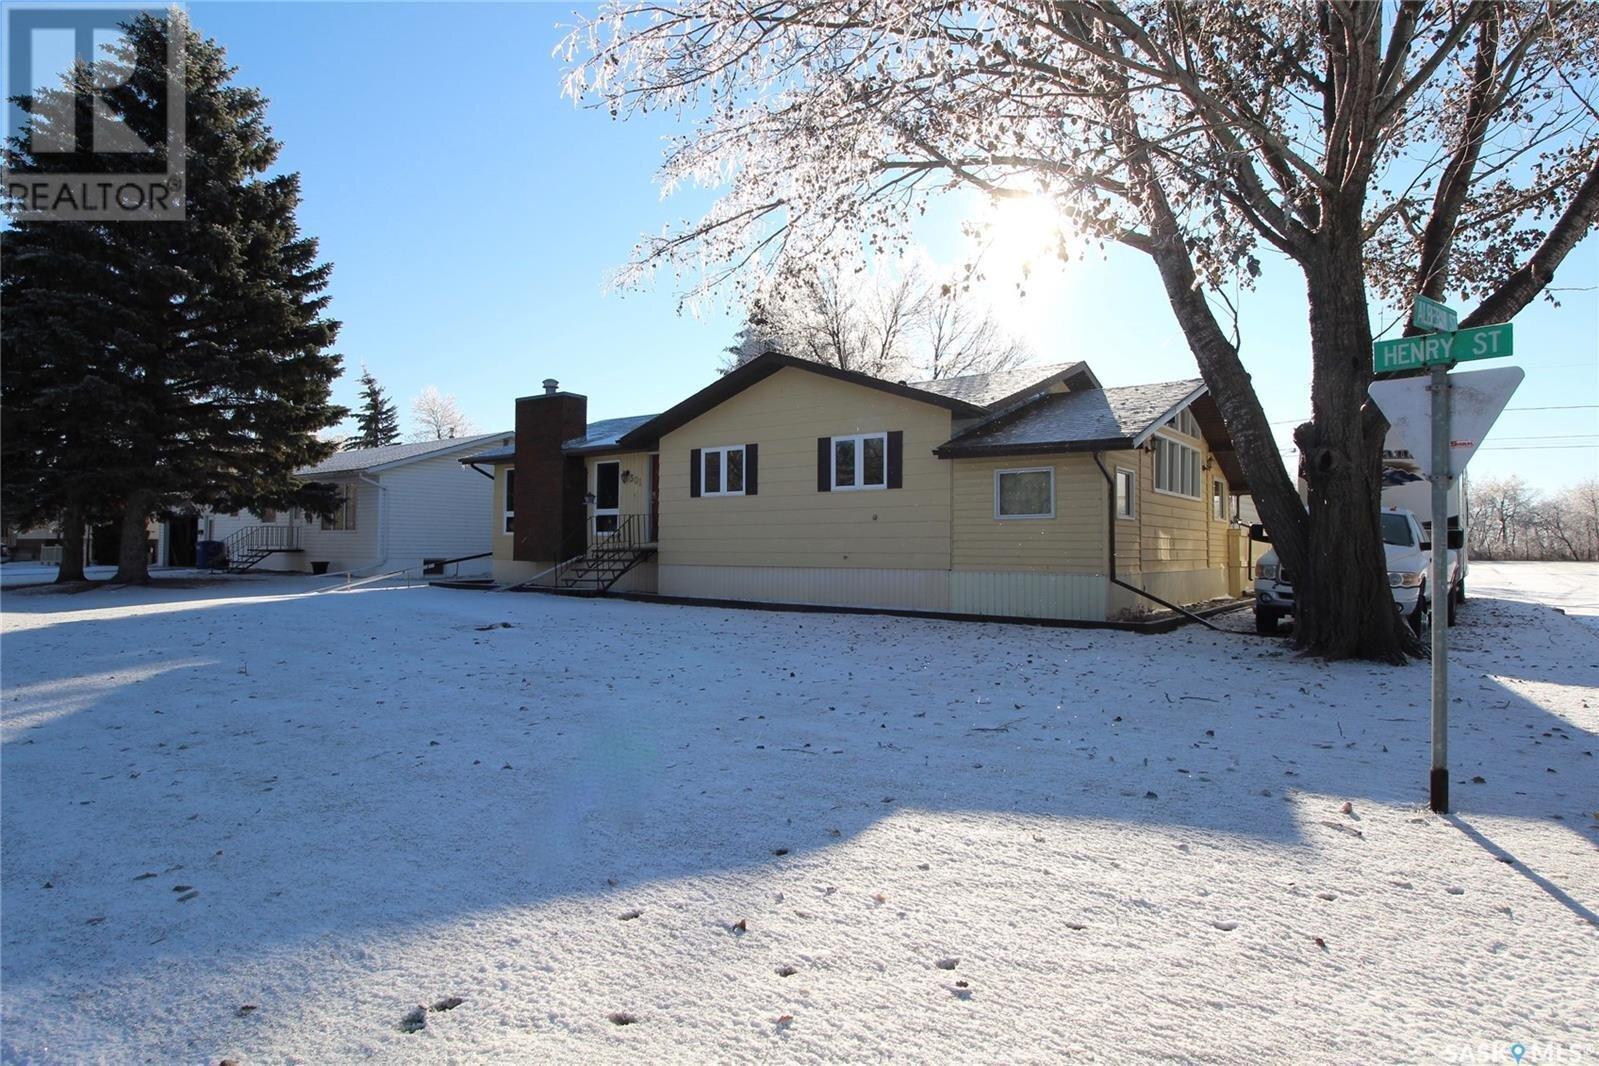 House for sale at 301 Henry St Moosomin Saskatchewan - MLS: SK833506